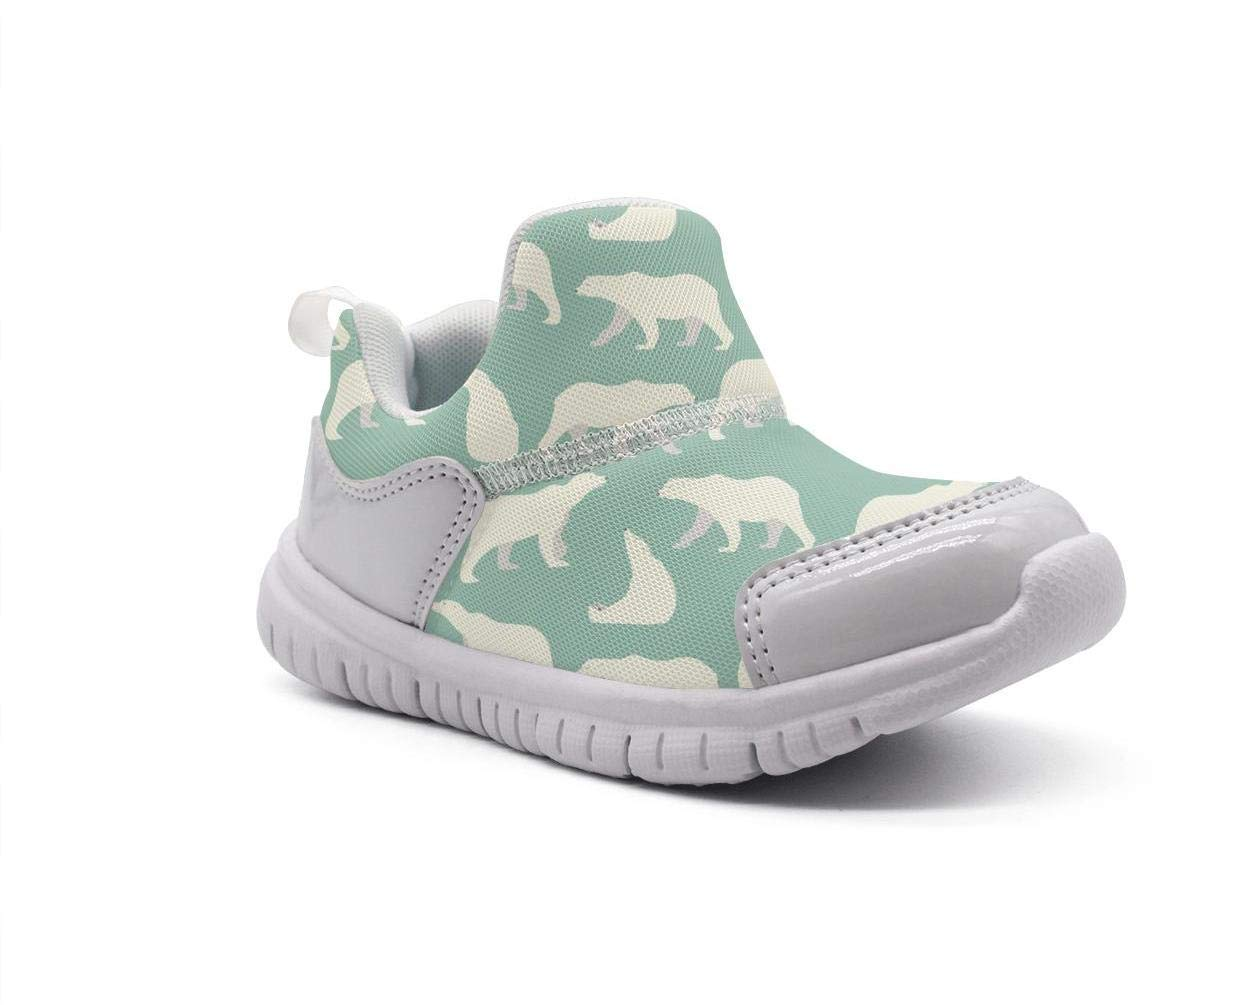 ONEYUAN Children Green Sun Bear Relax Kid Casual Lightweight Sport Shoes Sneakers Walking Athletic Shoes